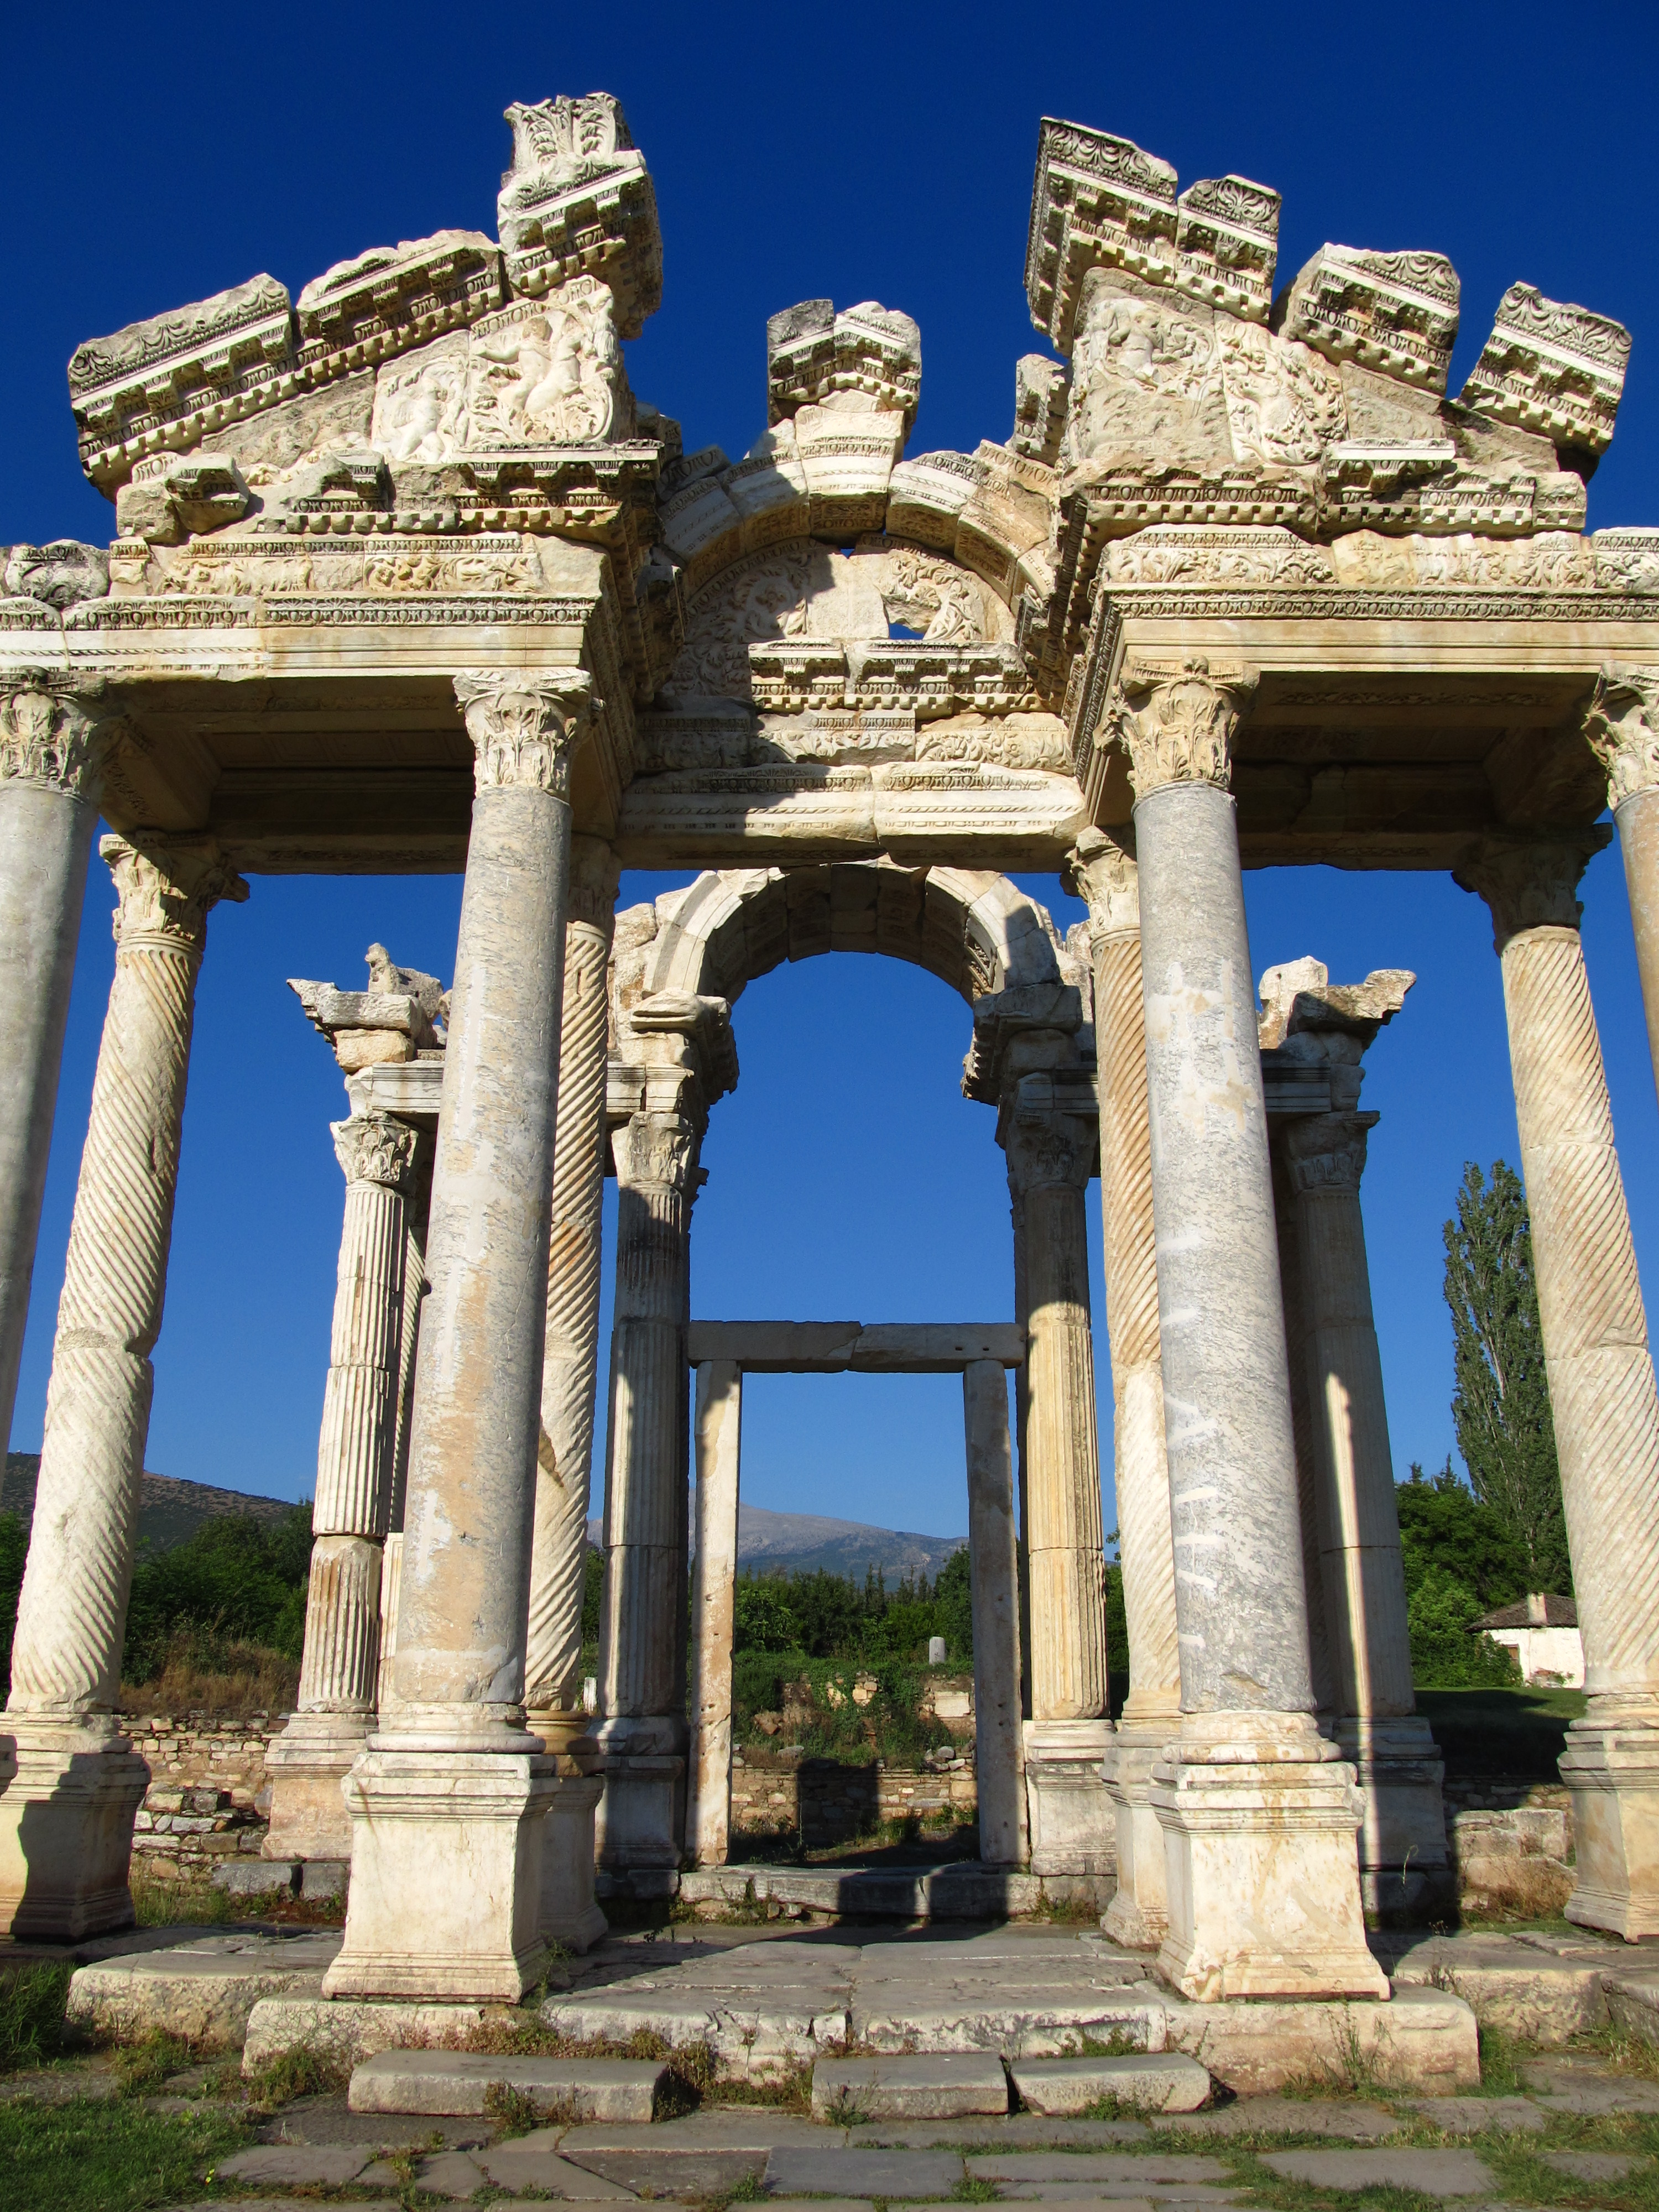 File:Aphrodisias temple of aphrodite.JPG - Wikimedia Commons